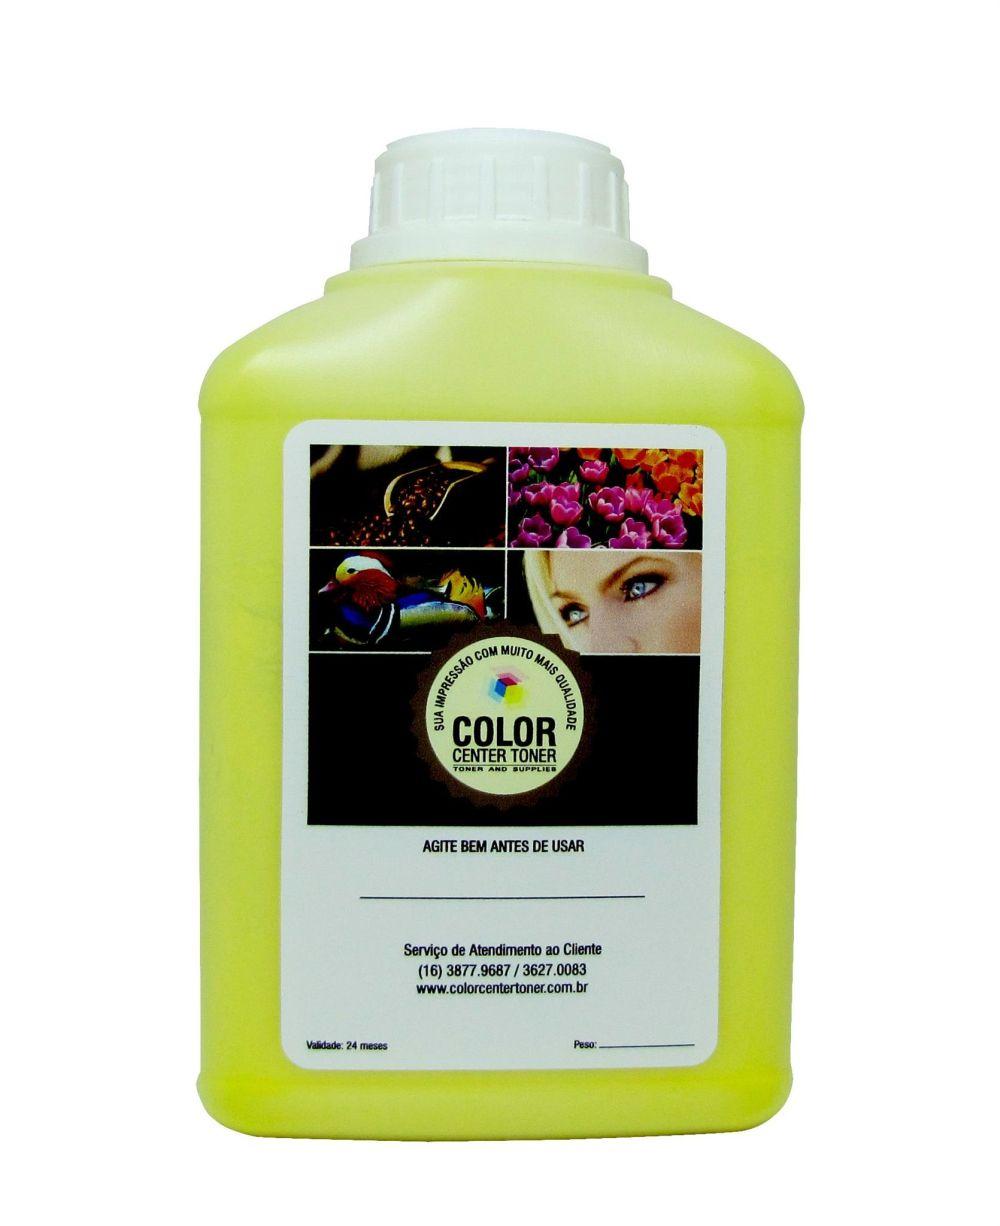 Refil de Toner Minolta C284 Amarelo